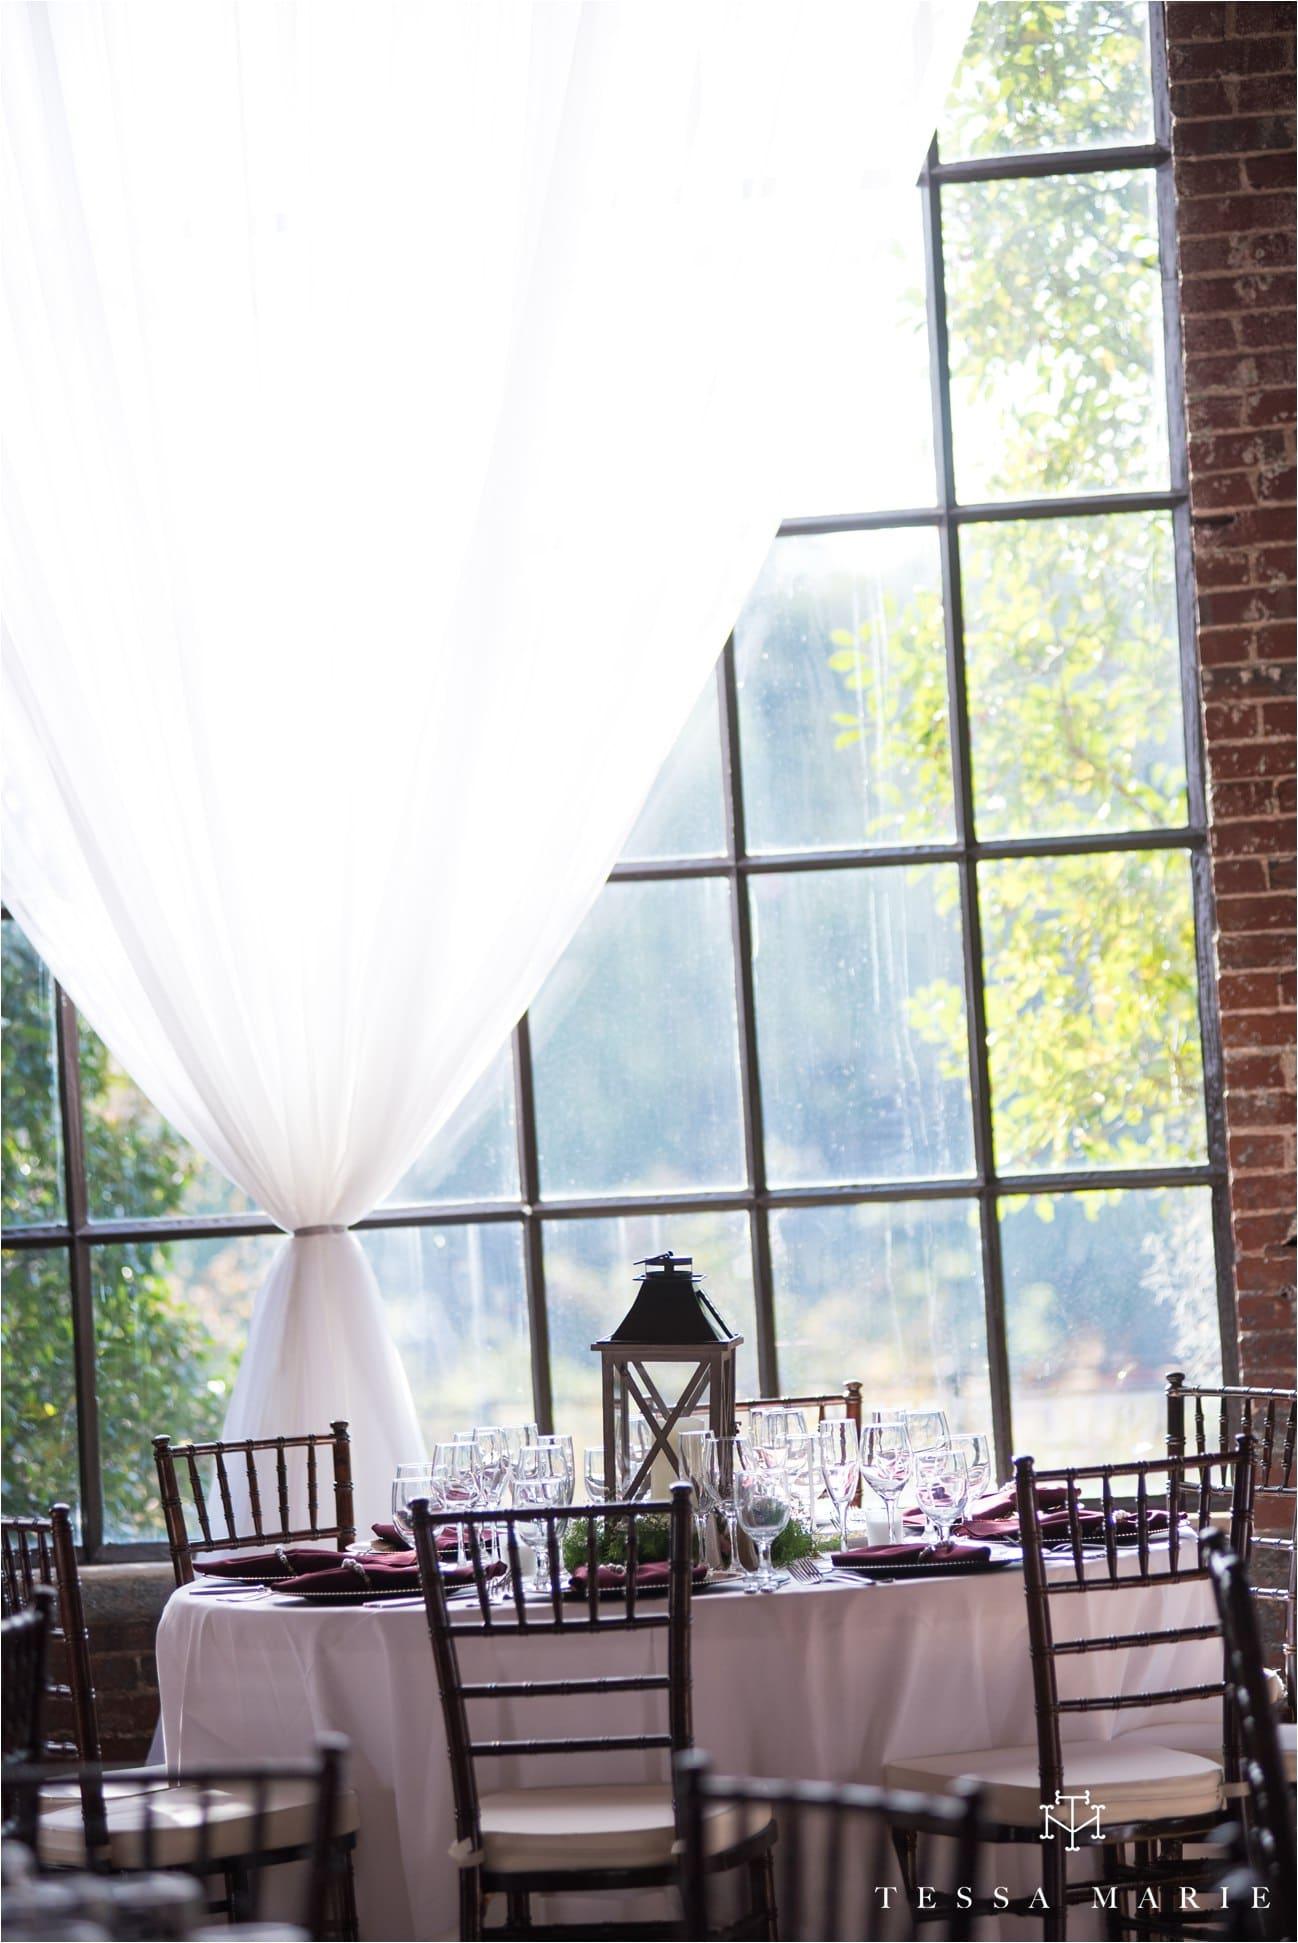 tessa_marie_weddings_rivermill_event_centere_candid_outdoor_wedding_photos_0158